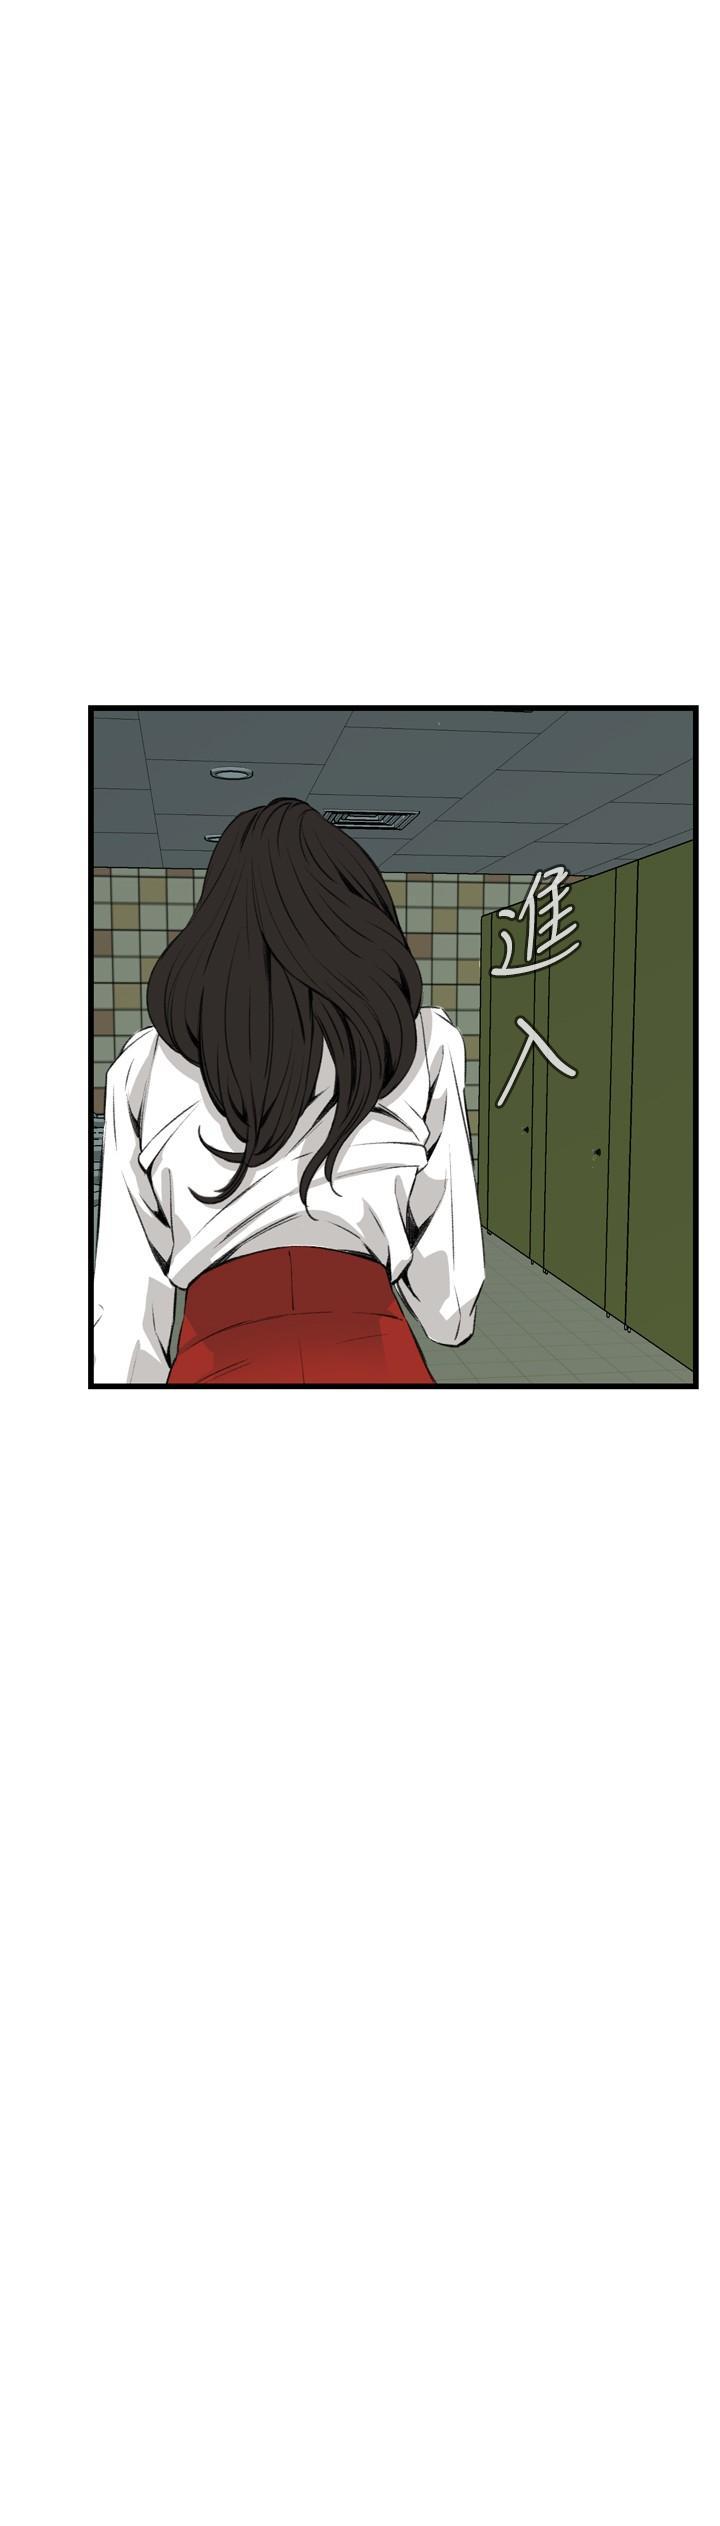 Take a Peek 偷窥 Ch.39~55 [Chinese]中文 361